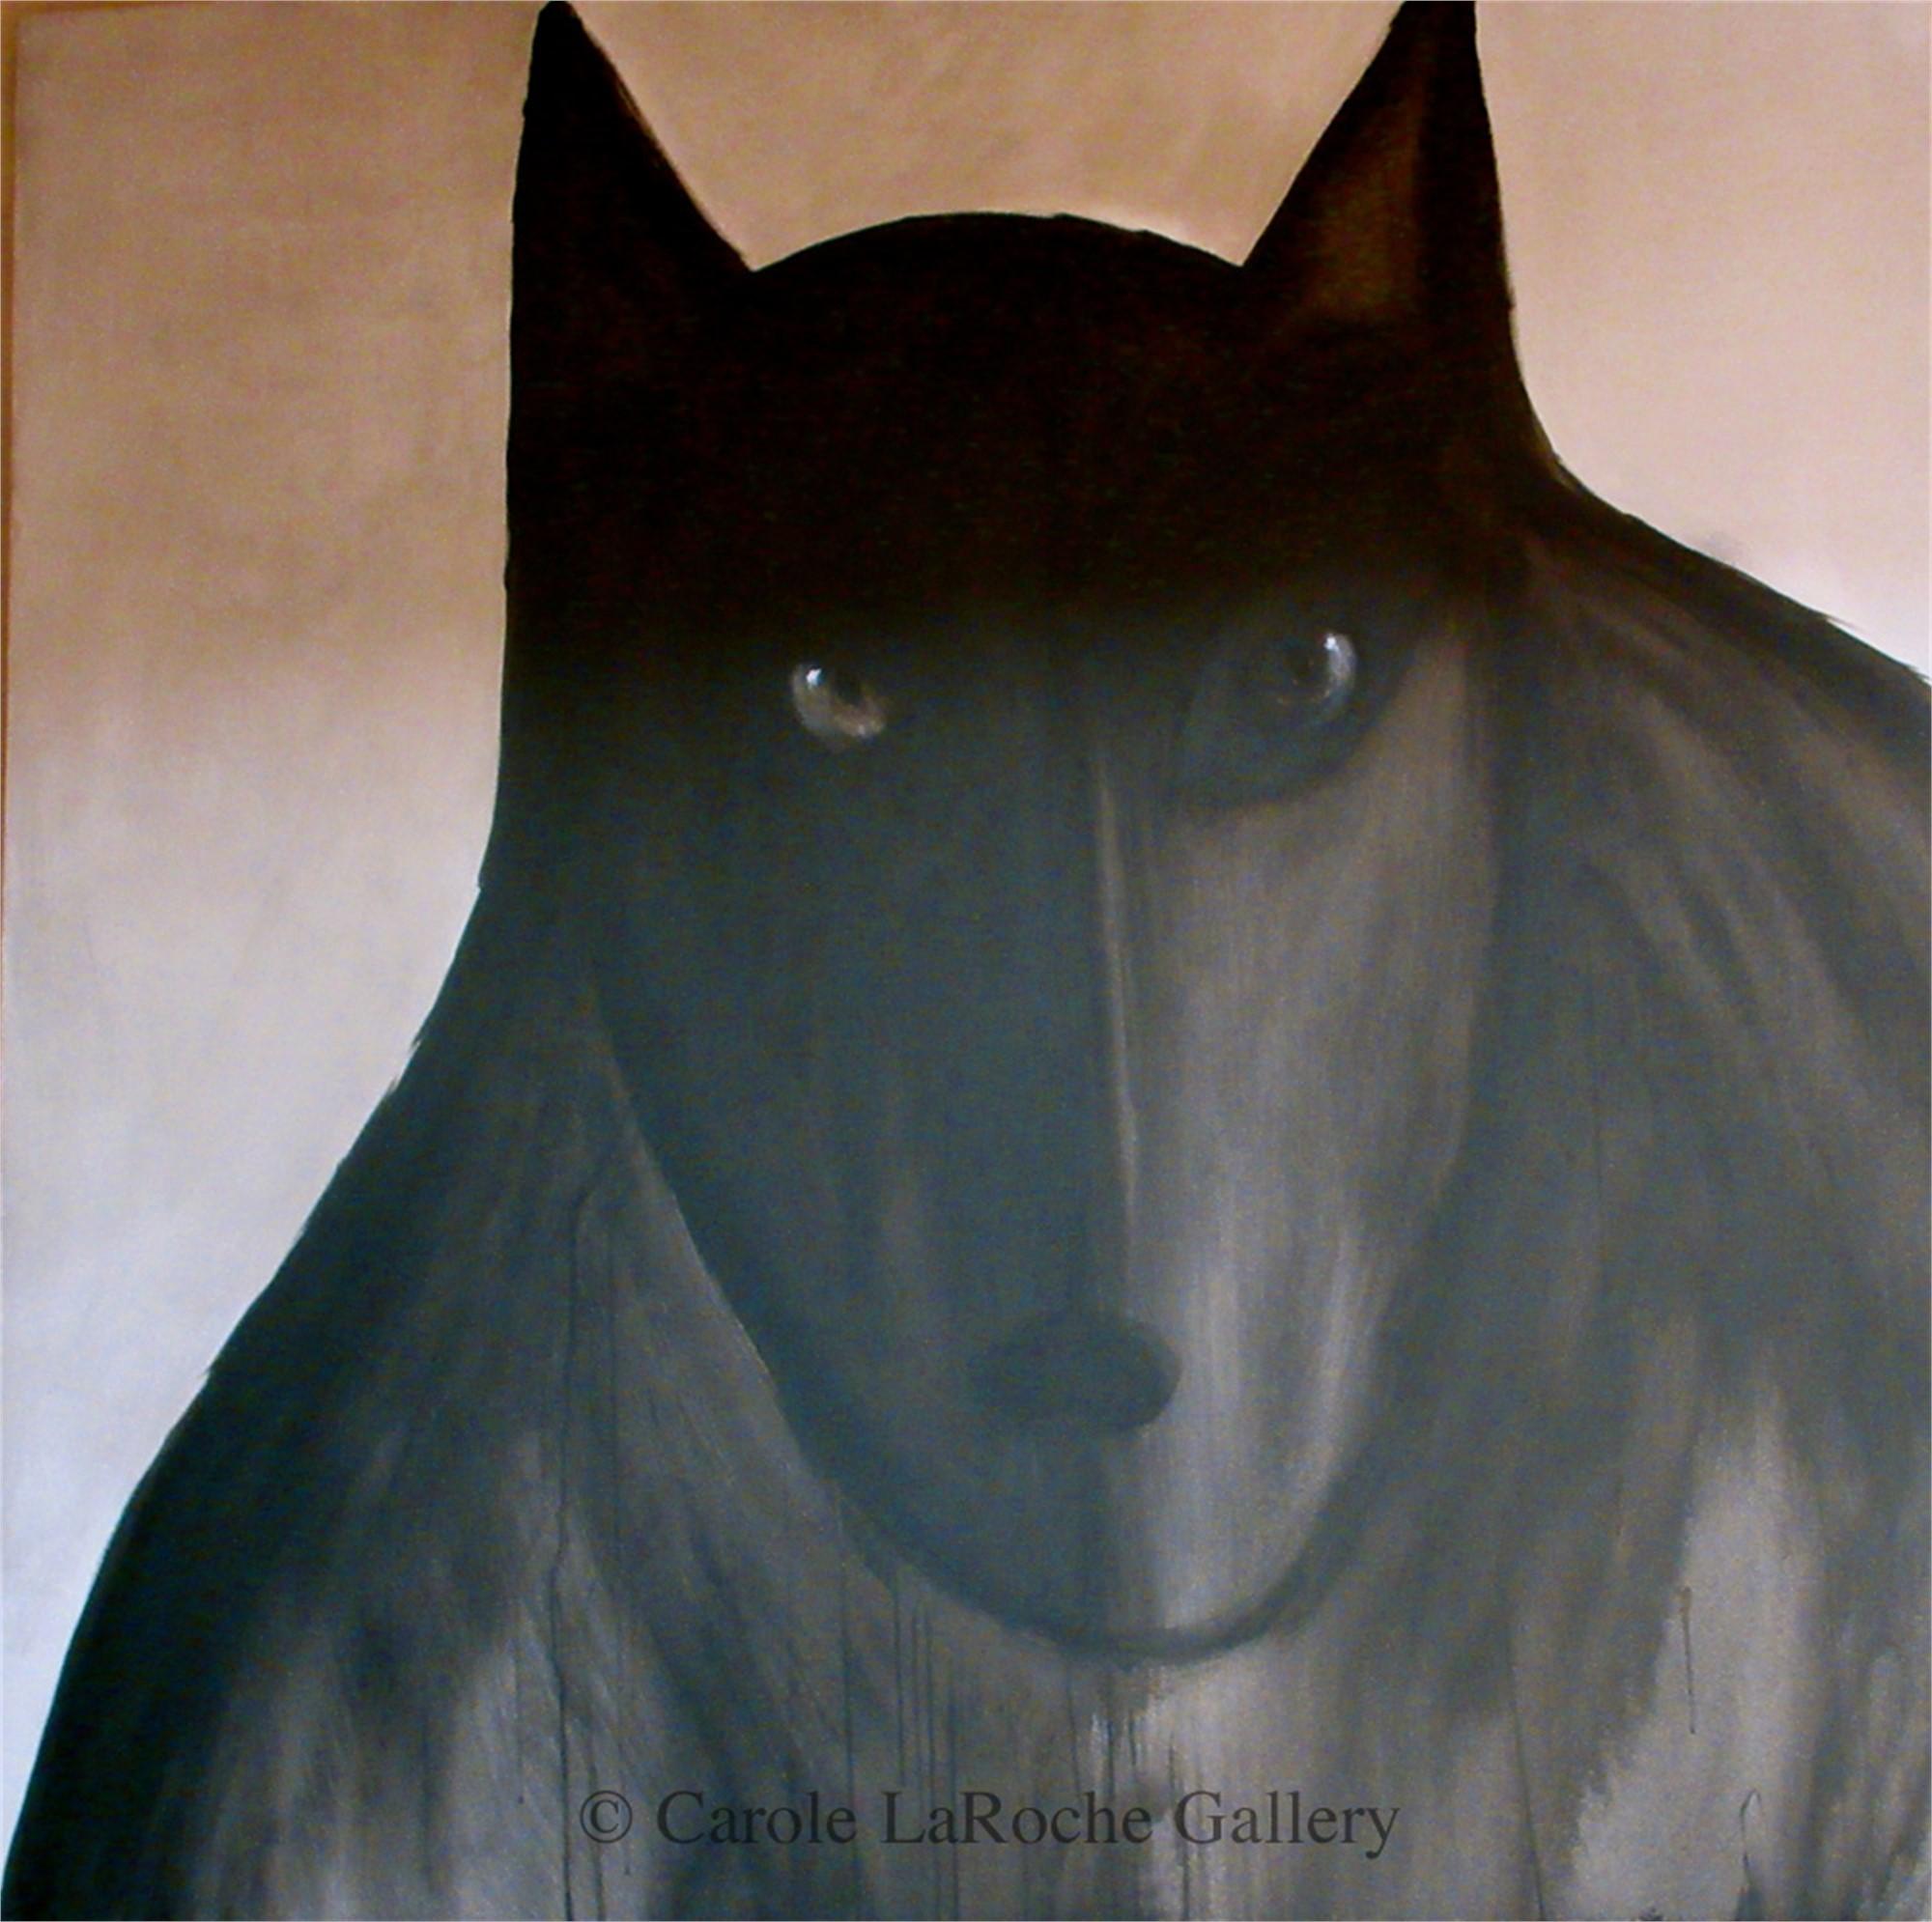 GRANDE MIDNIGHT WOLF by Carole LaRoche